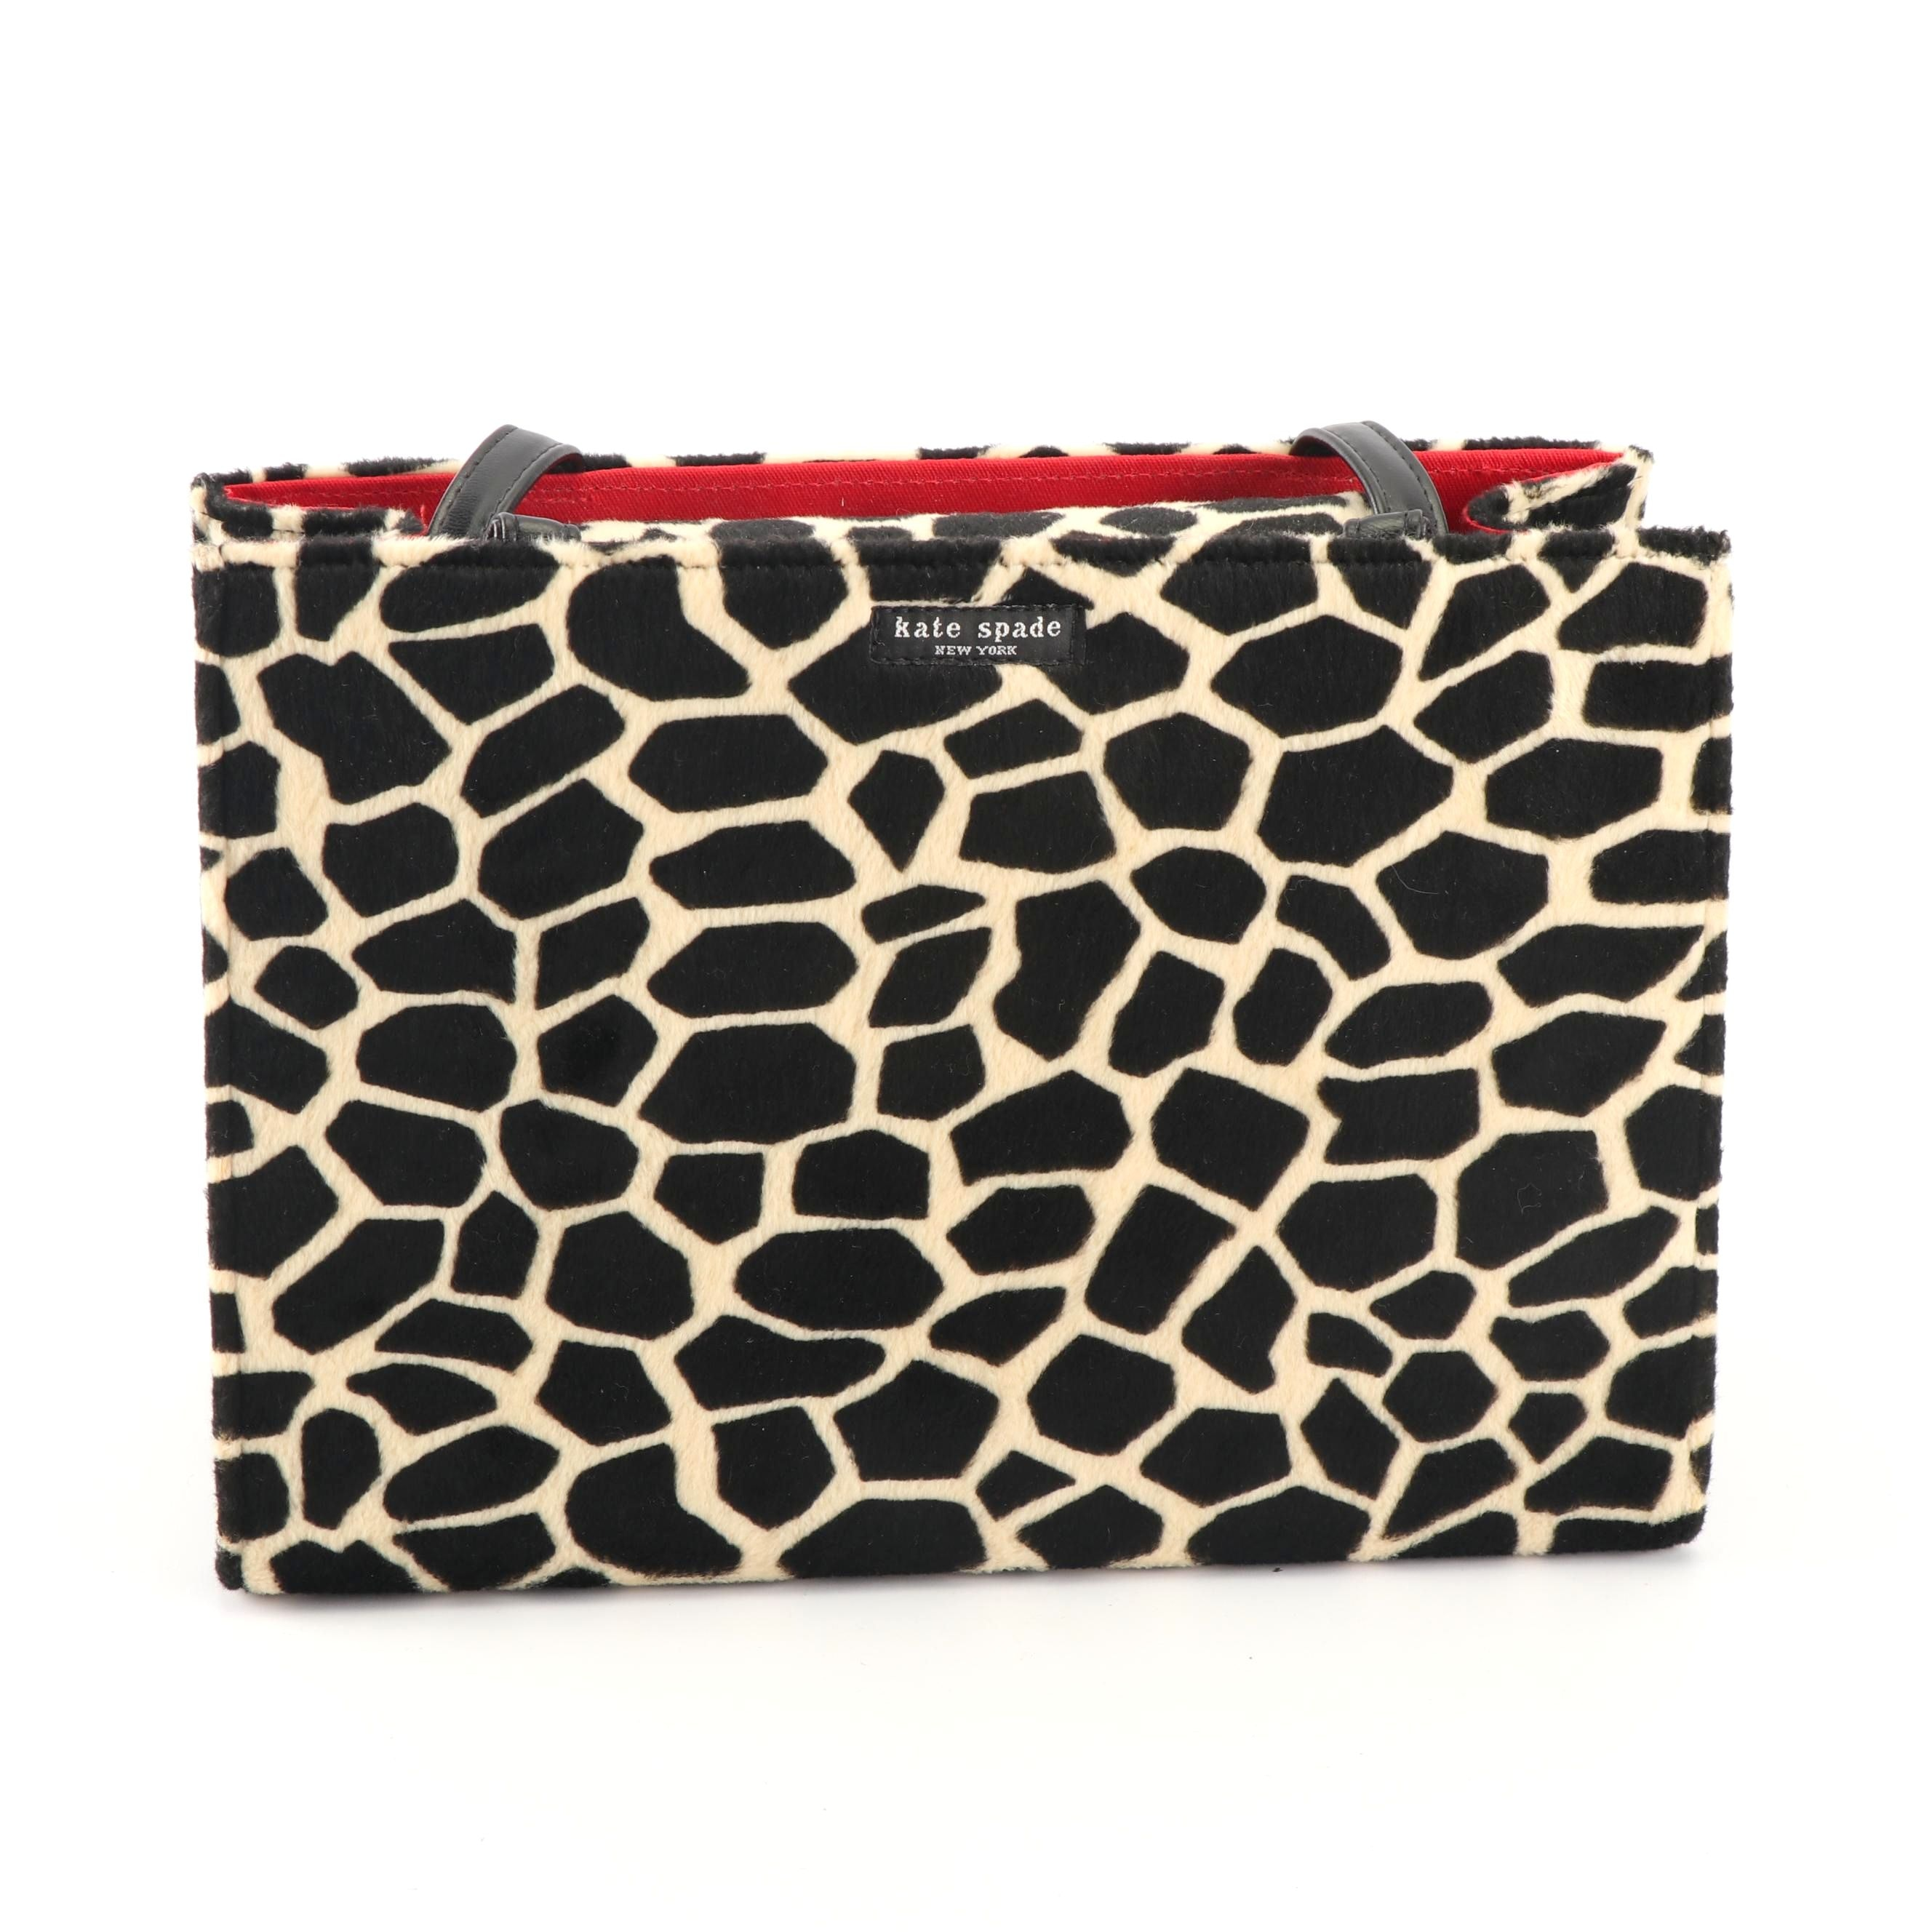 Kate Spade New York Sam Faux Fur Giraffe Print Structured Shoulder Bag